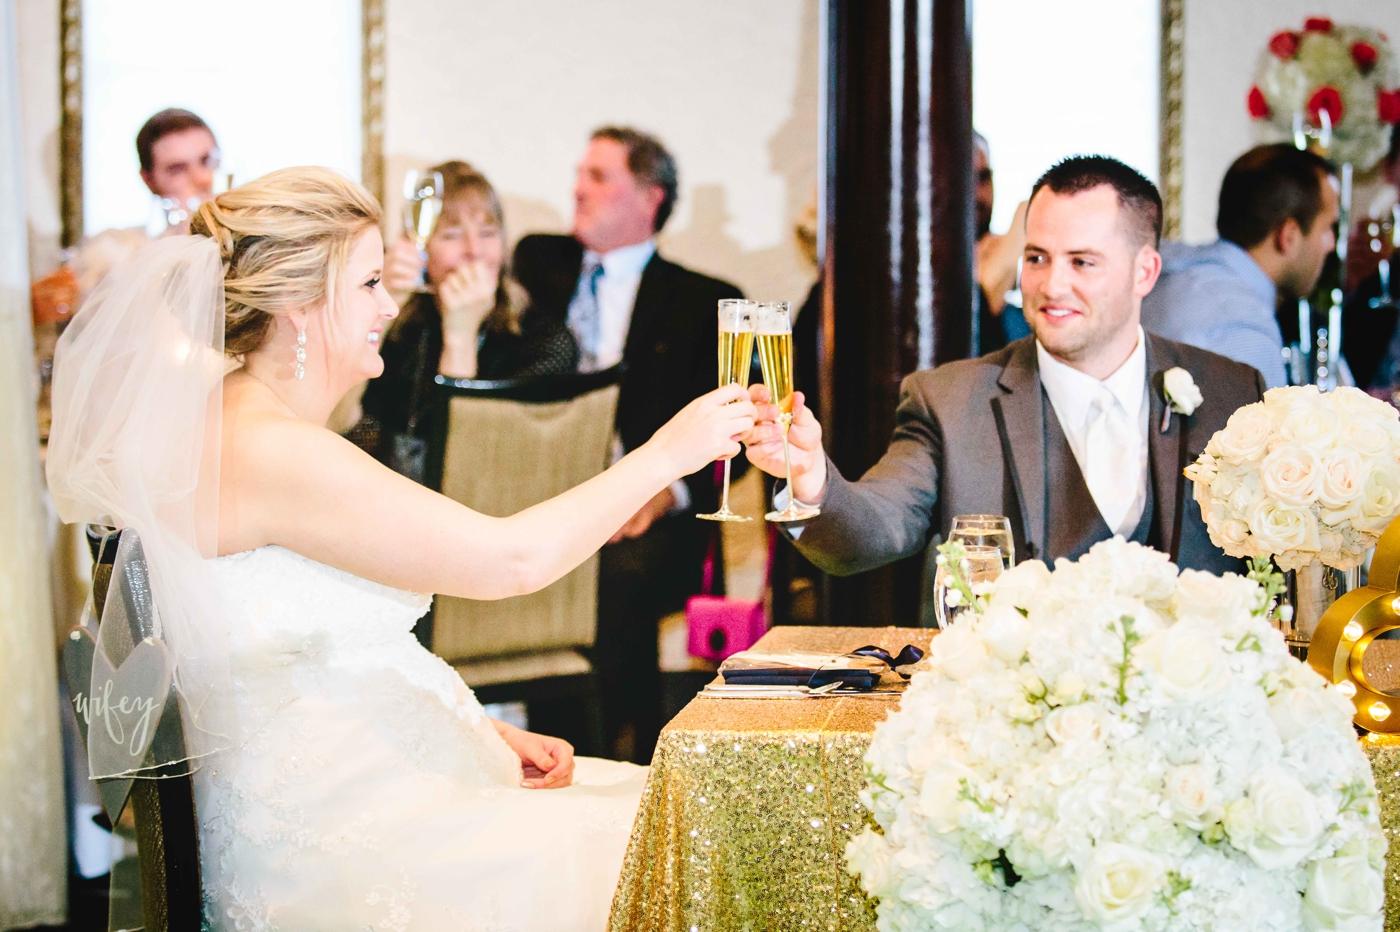 chicago-fine-art-wedding-photography-cassady22